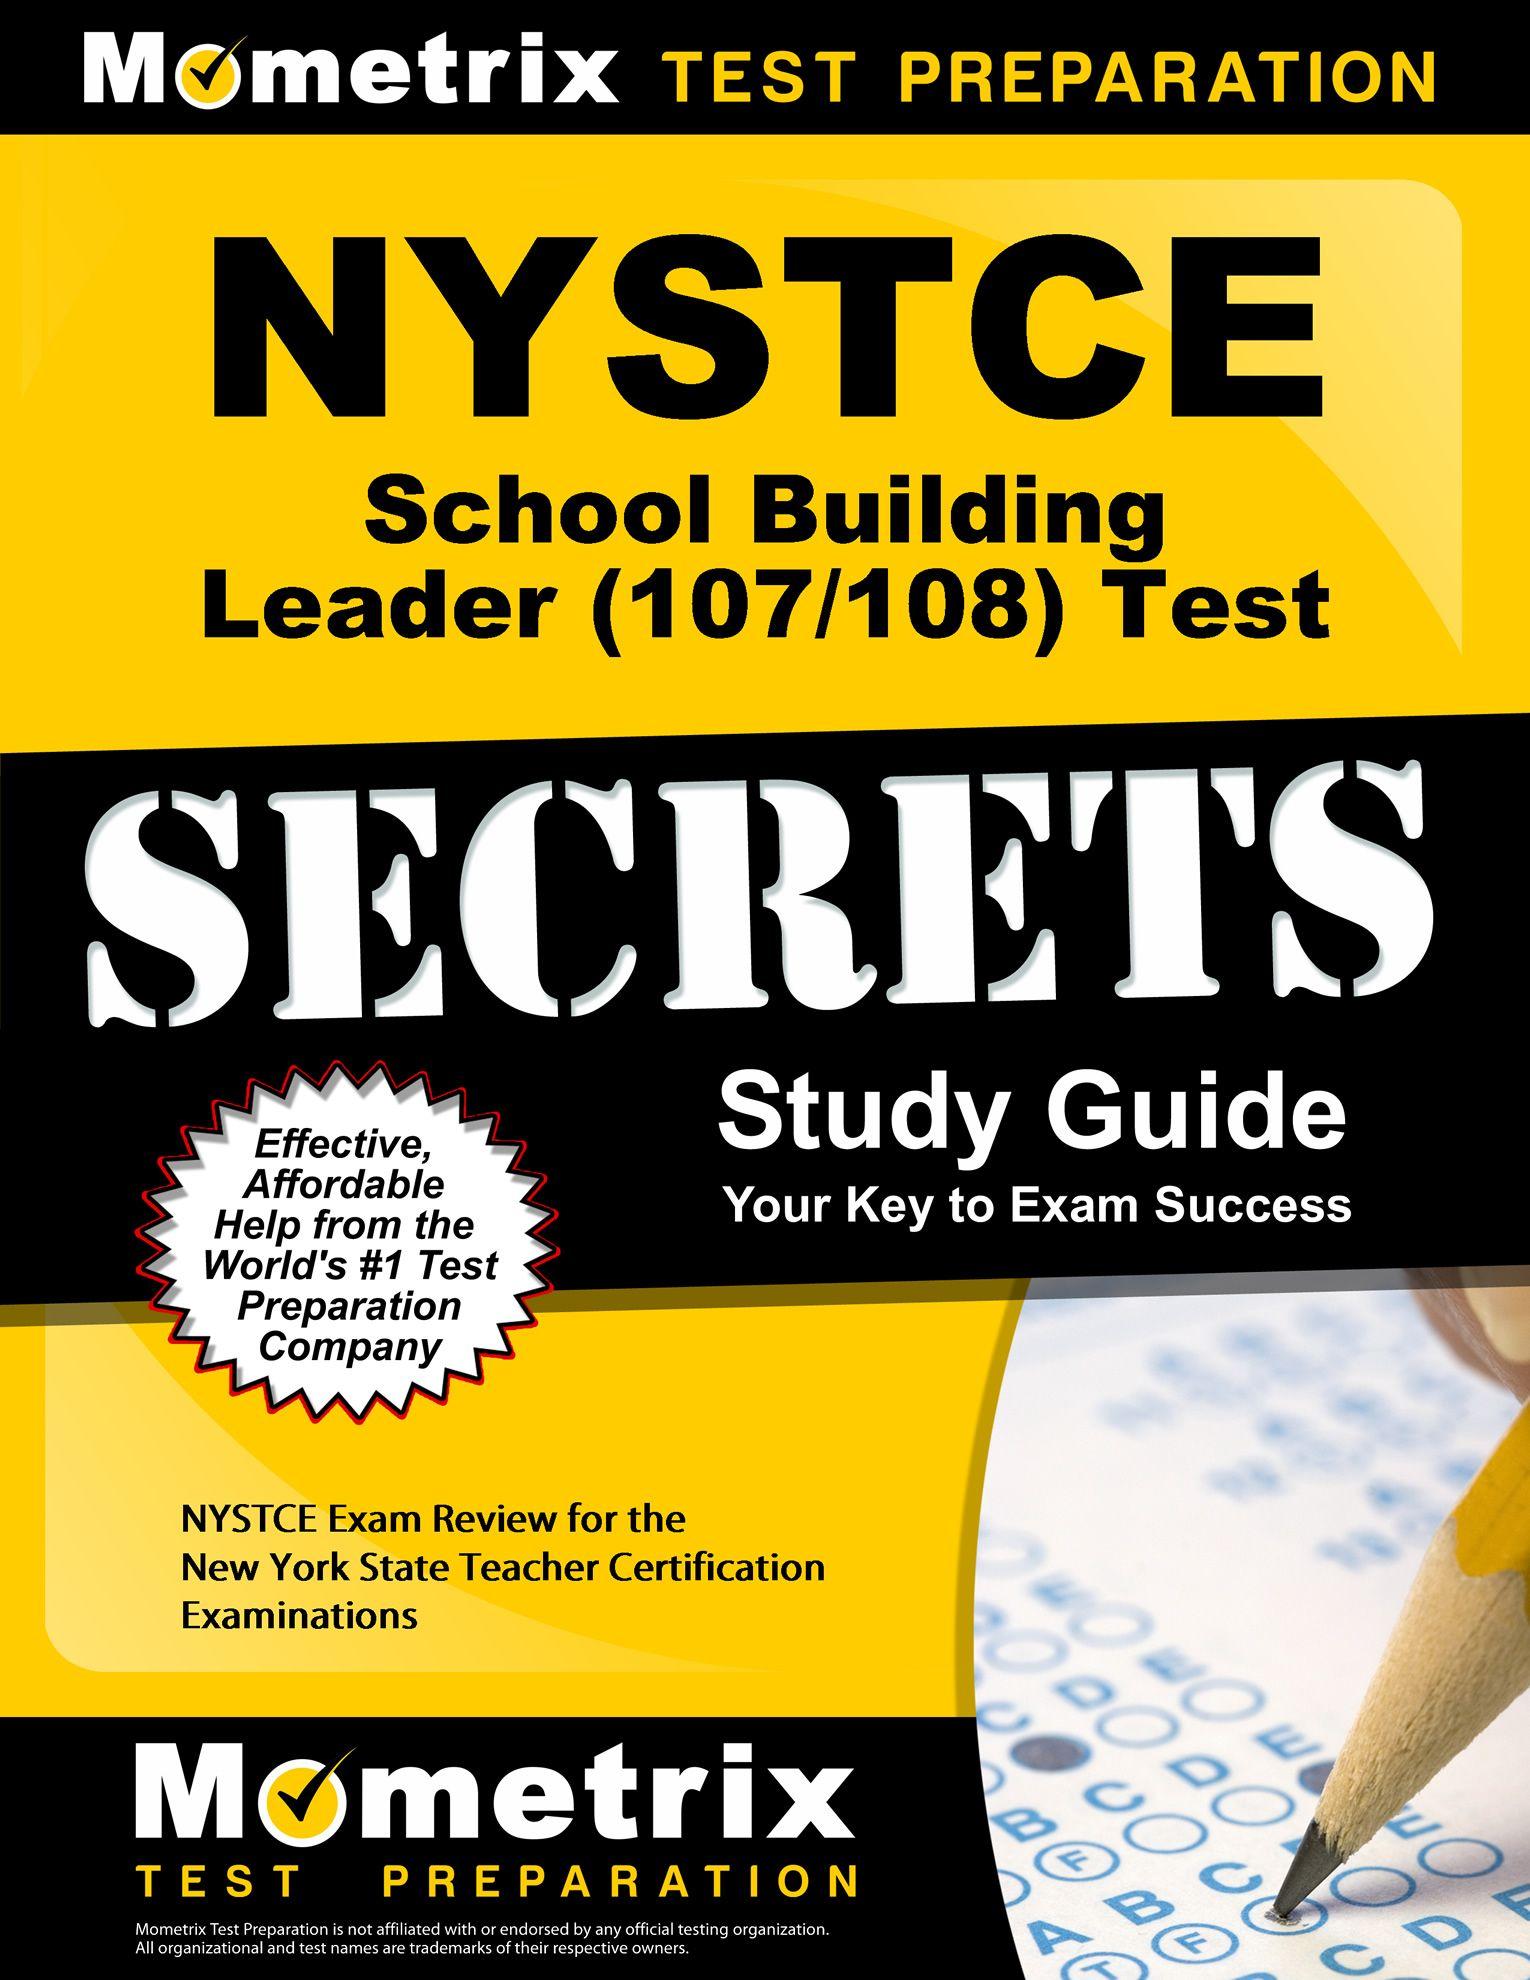 NYSTCE School Building Leader (107/108) Test Secrets Study Guide ...